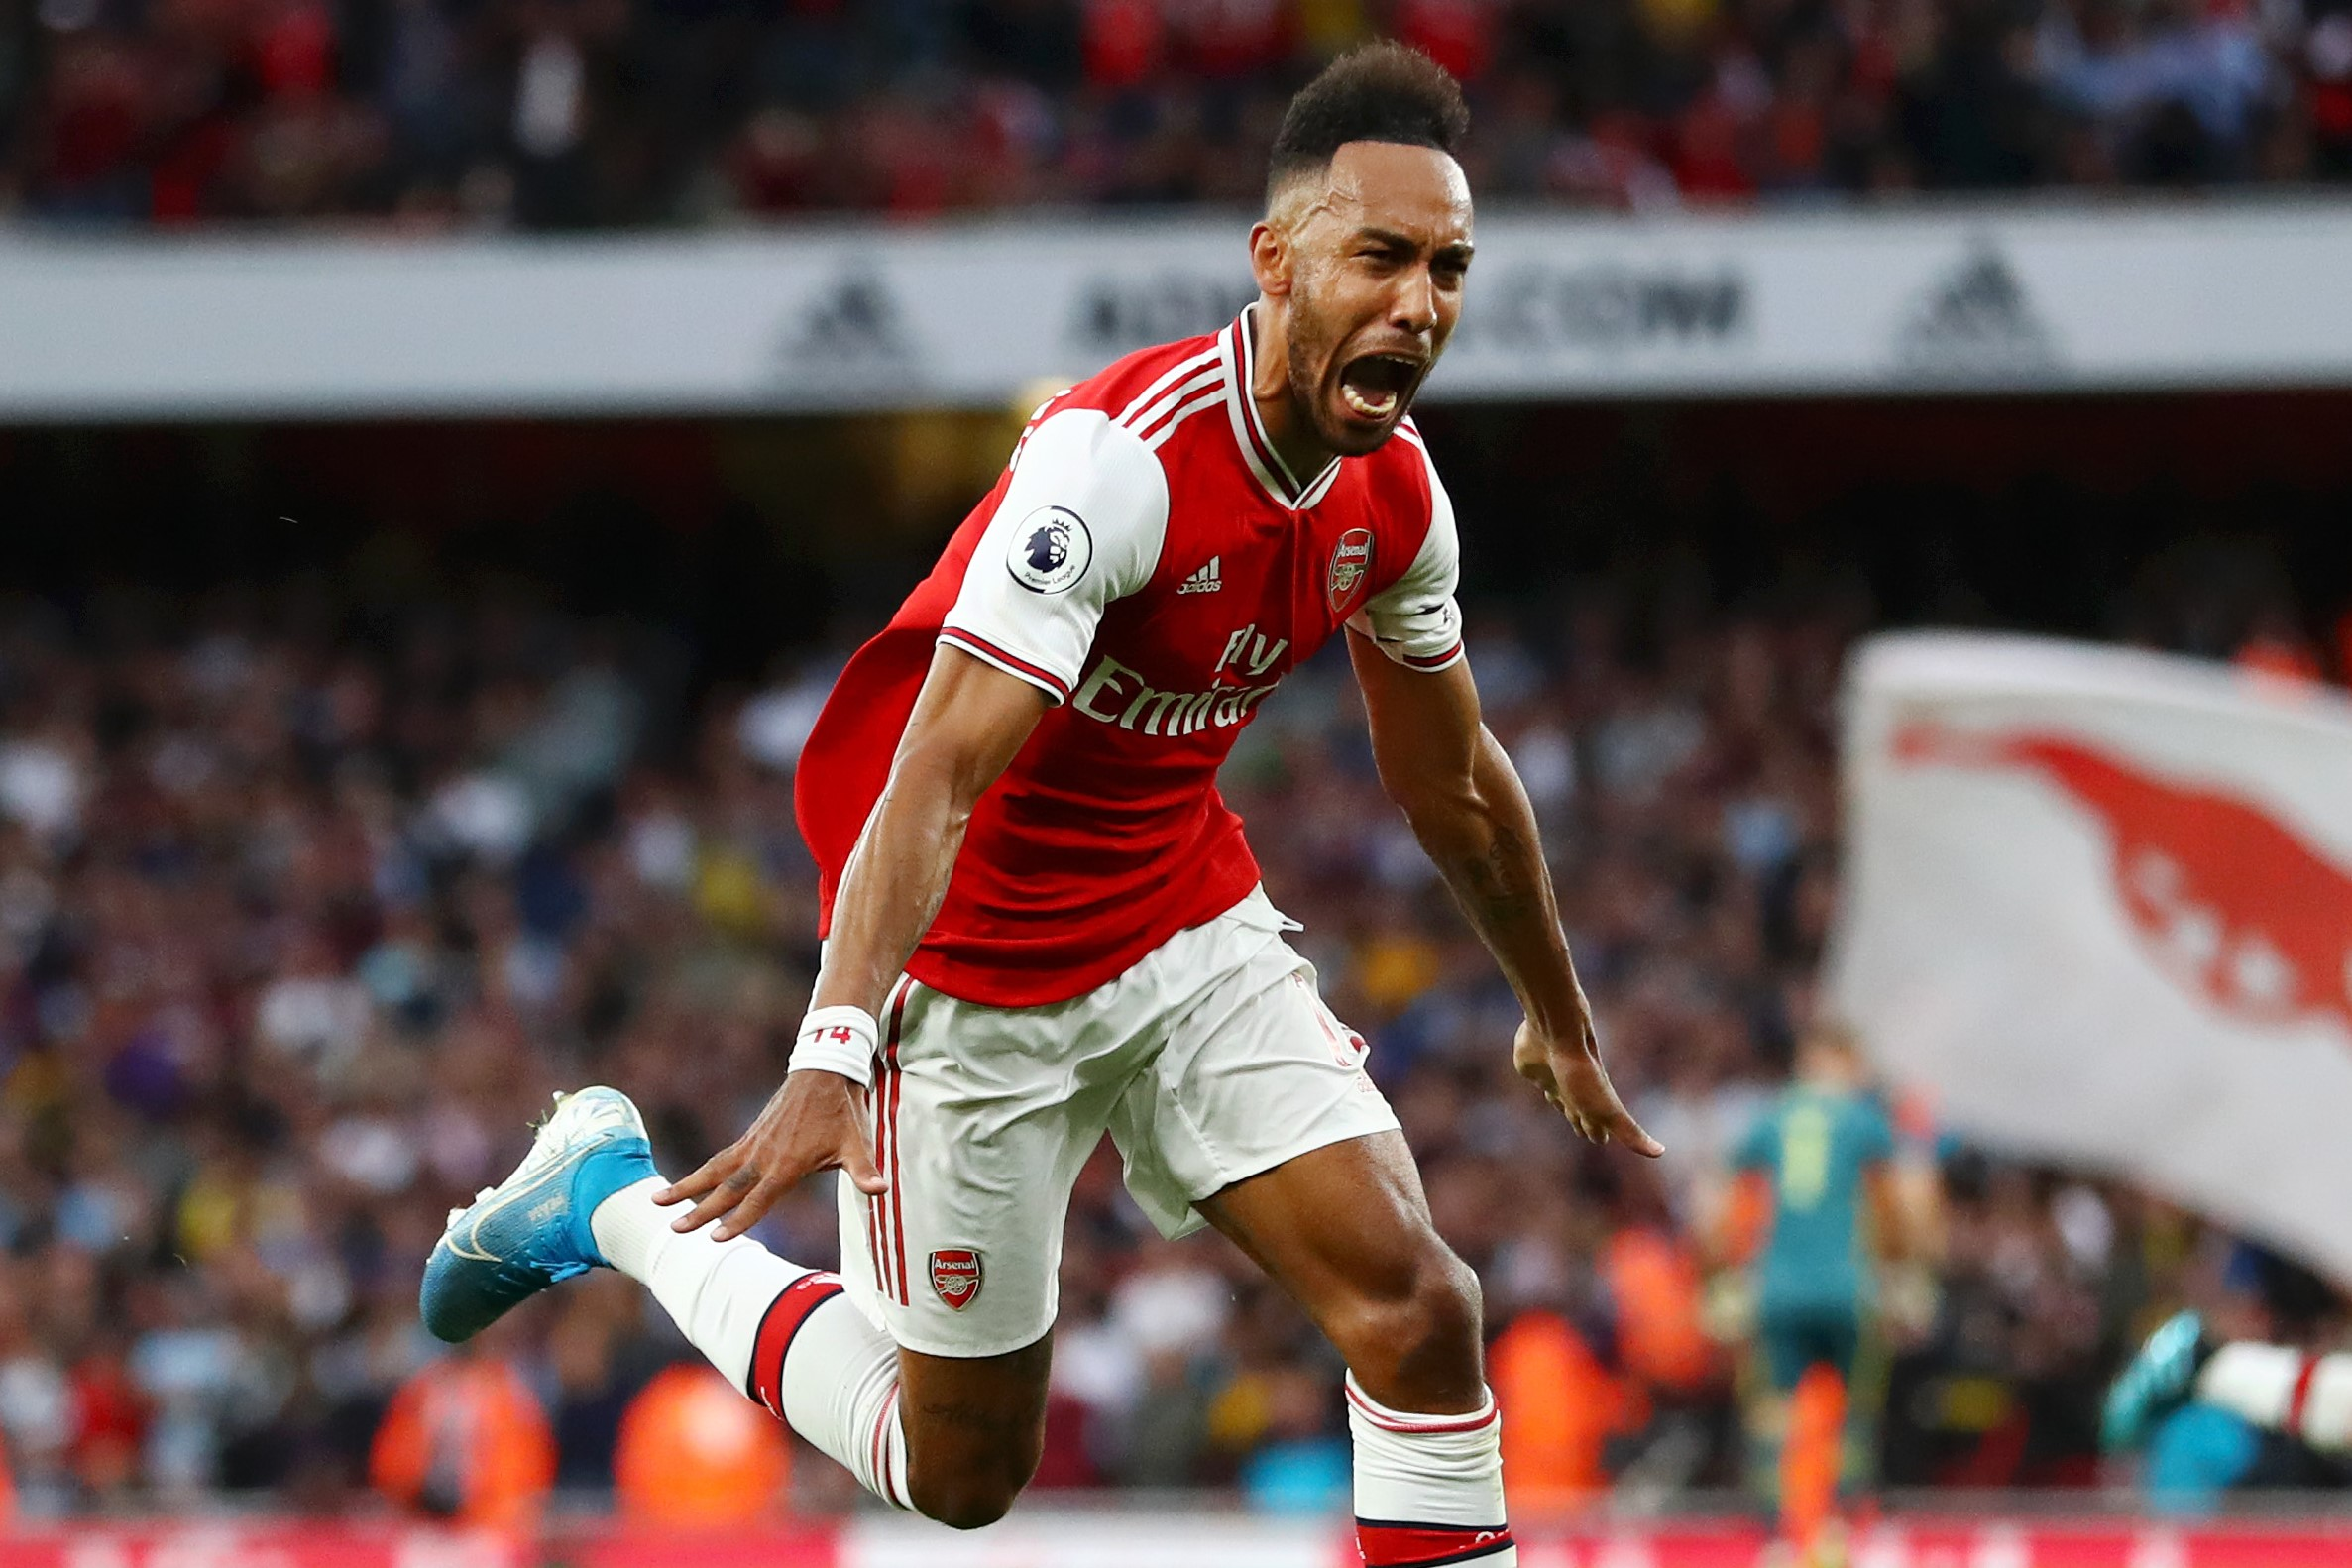 Arsenal FC v Aston Villa – Premier League